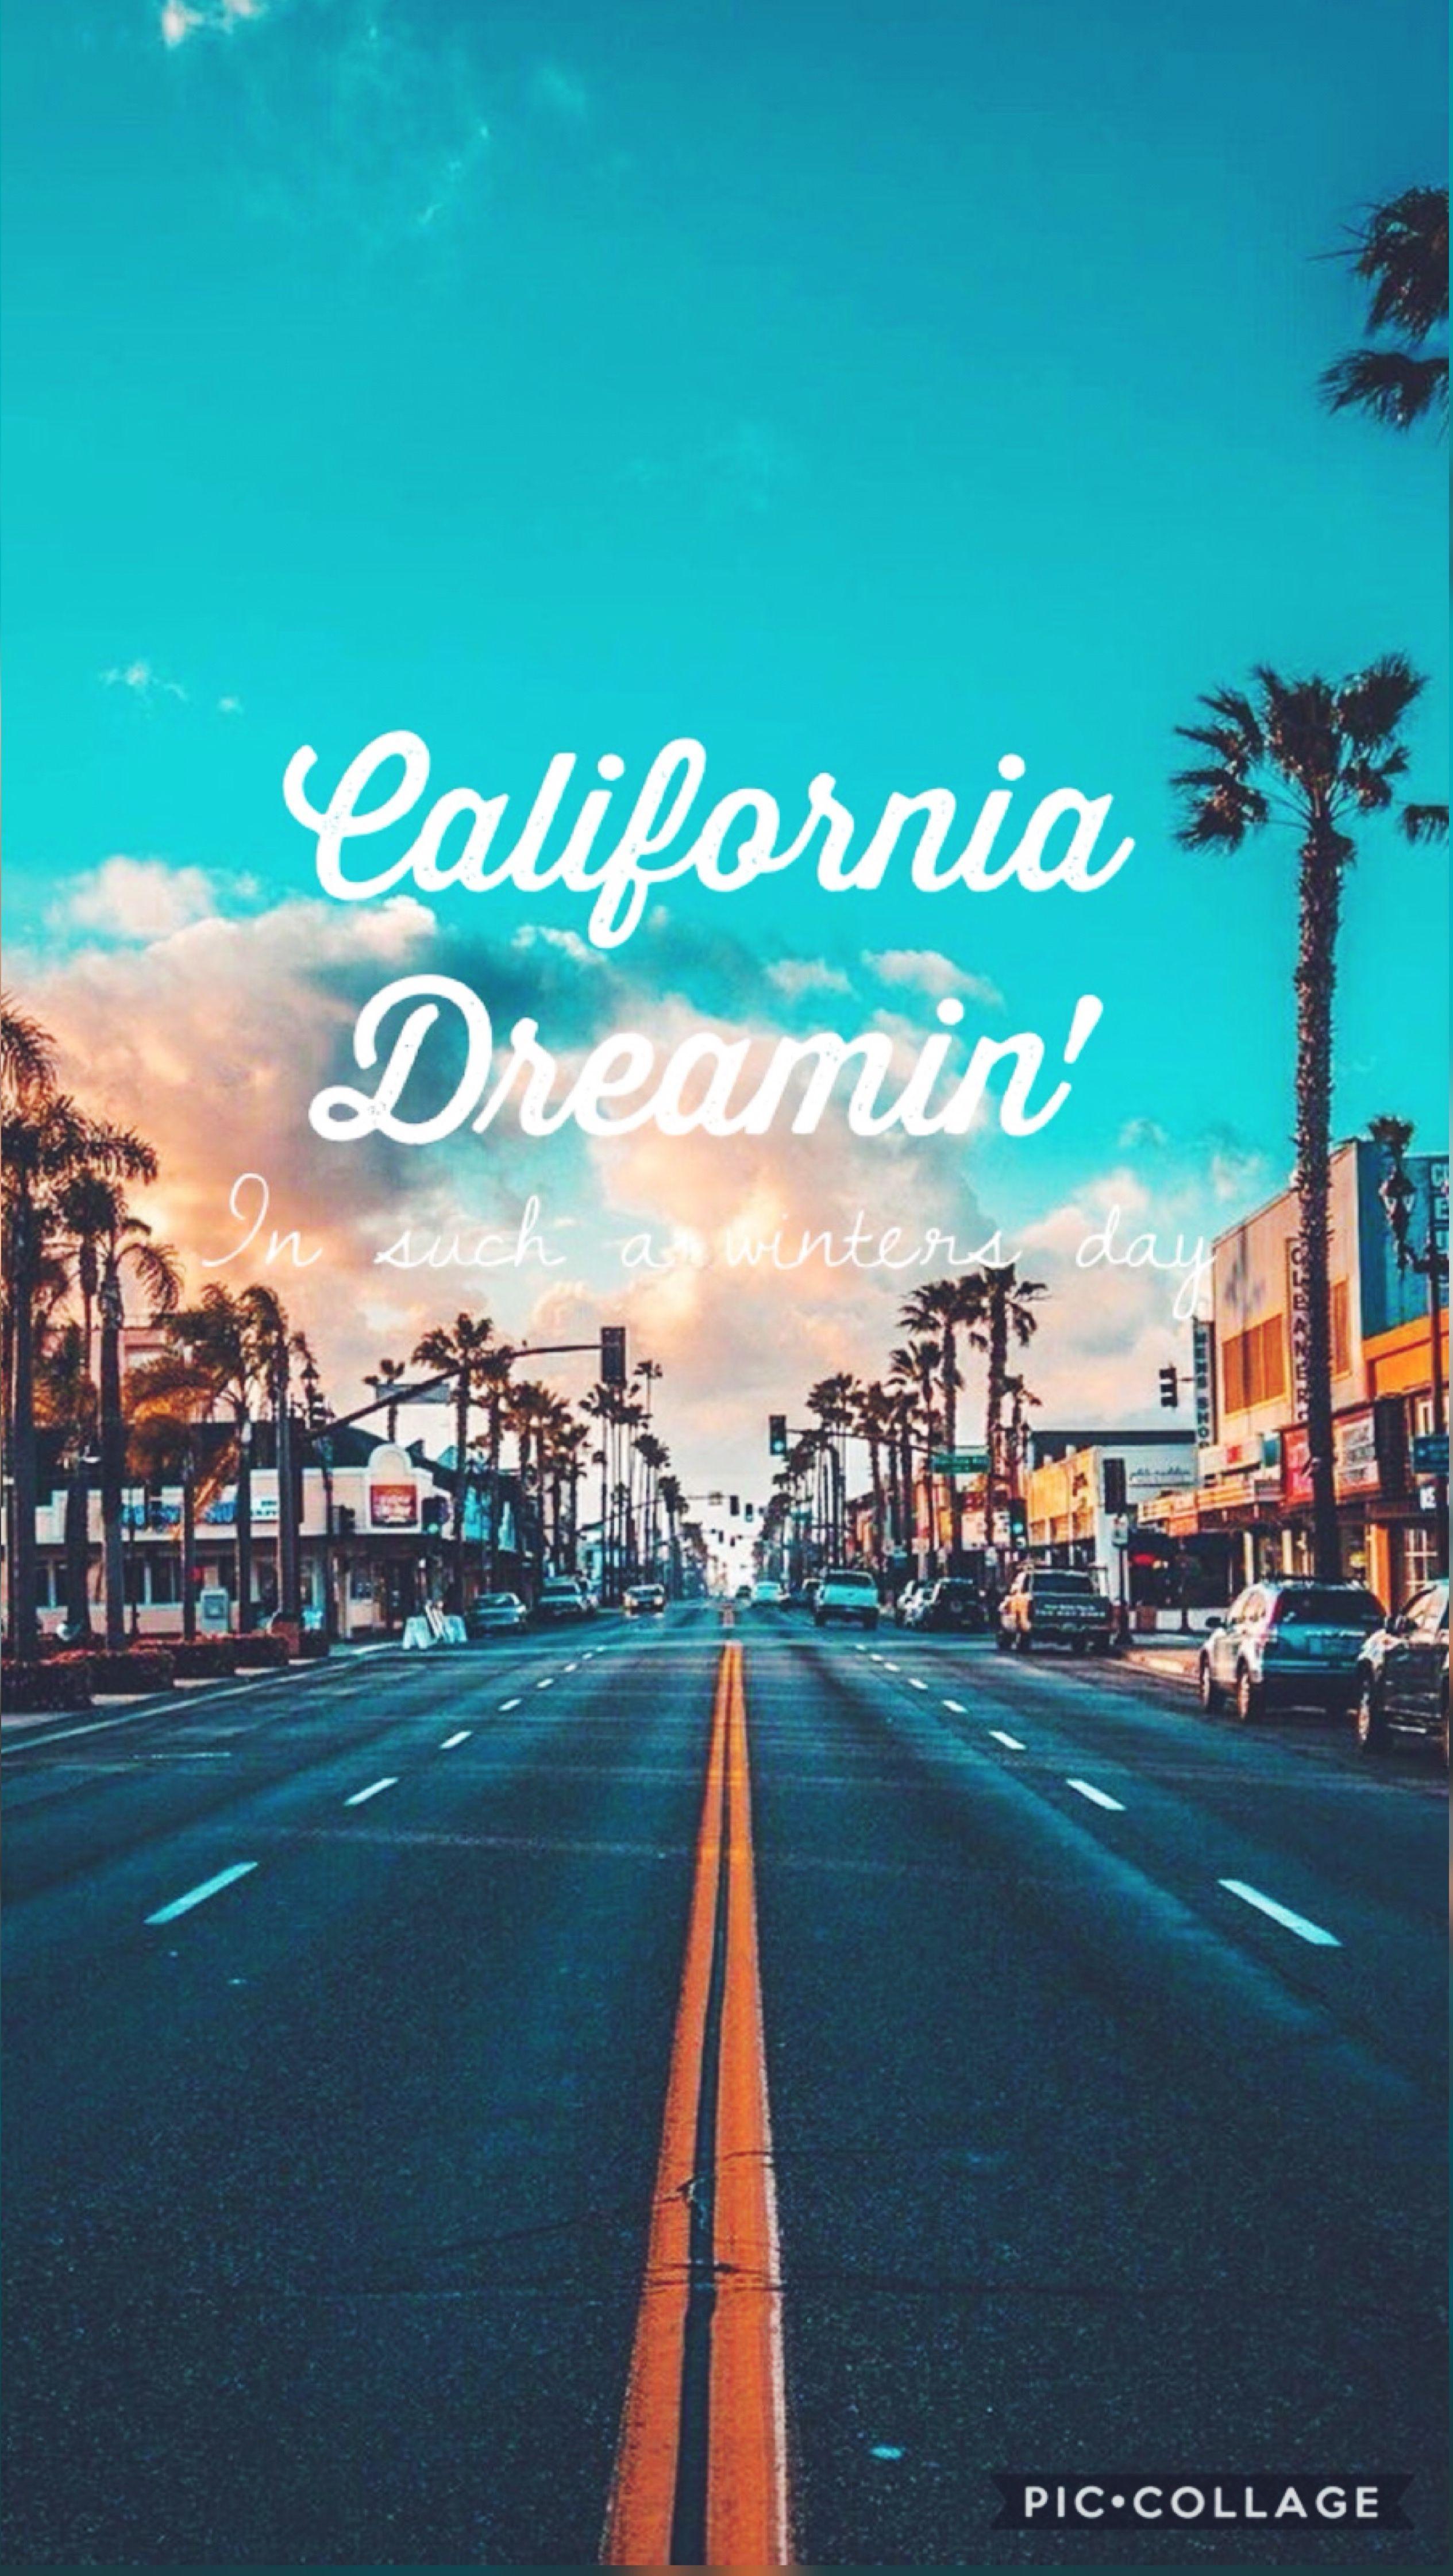 California /LA Wallpaper Califórnia Dreamin // The Mamas